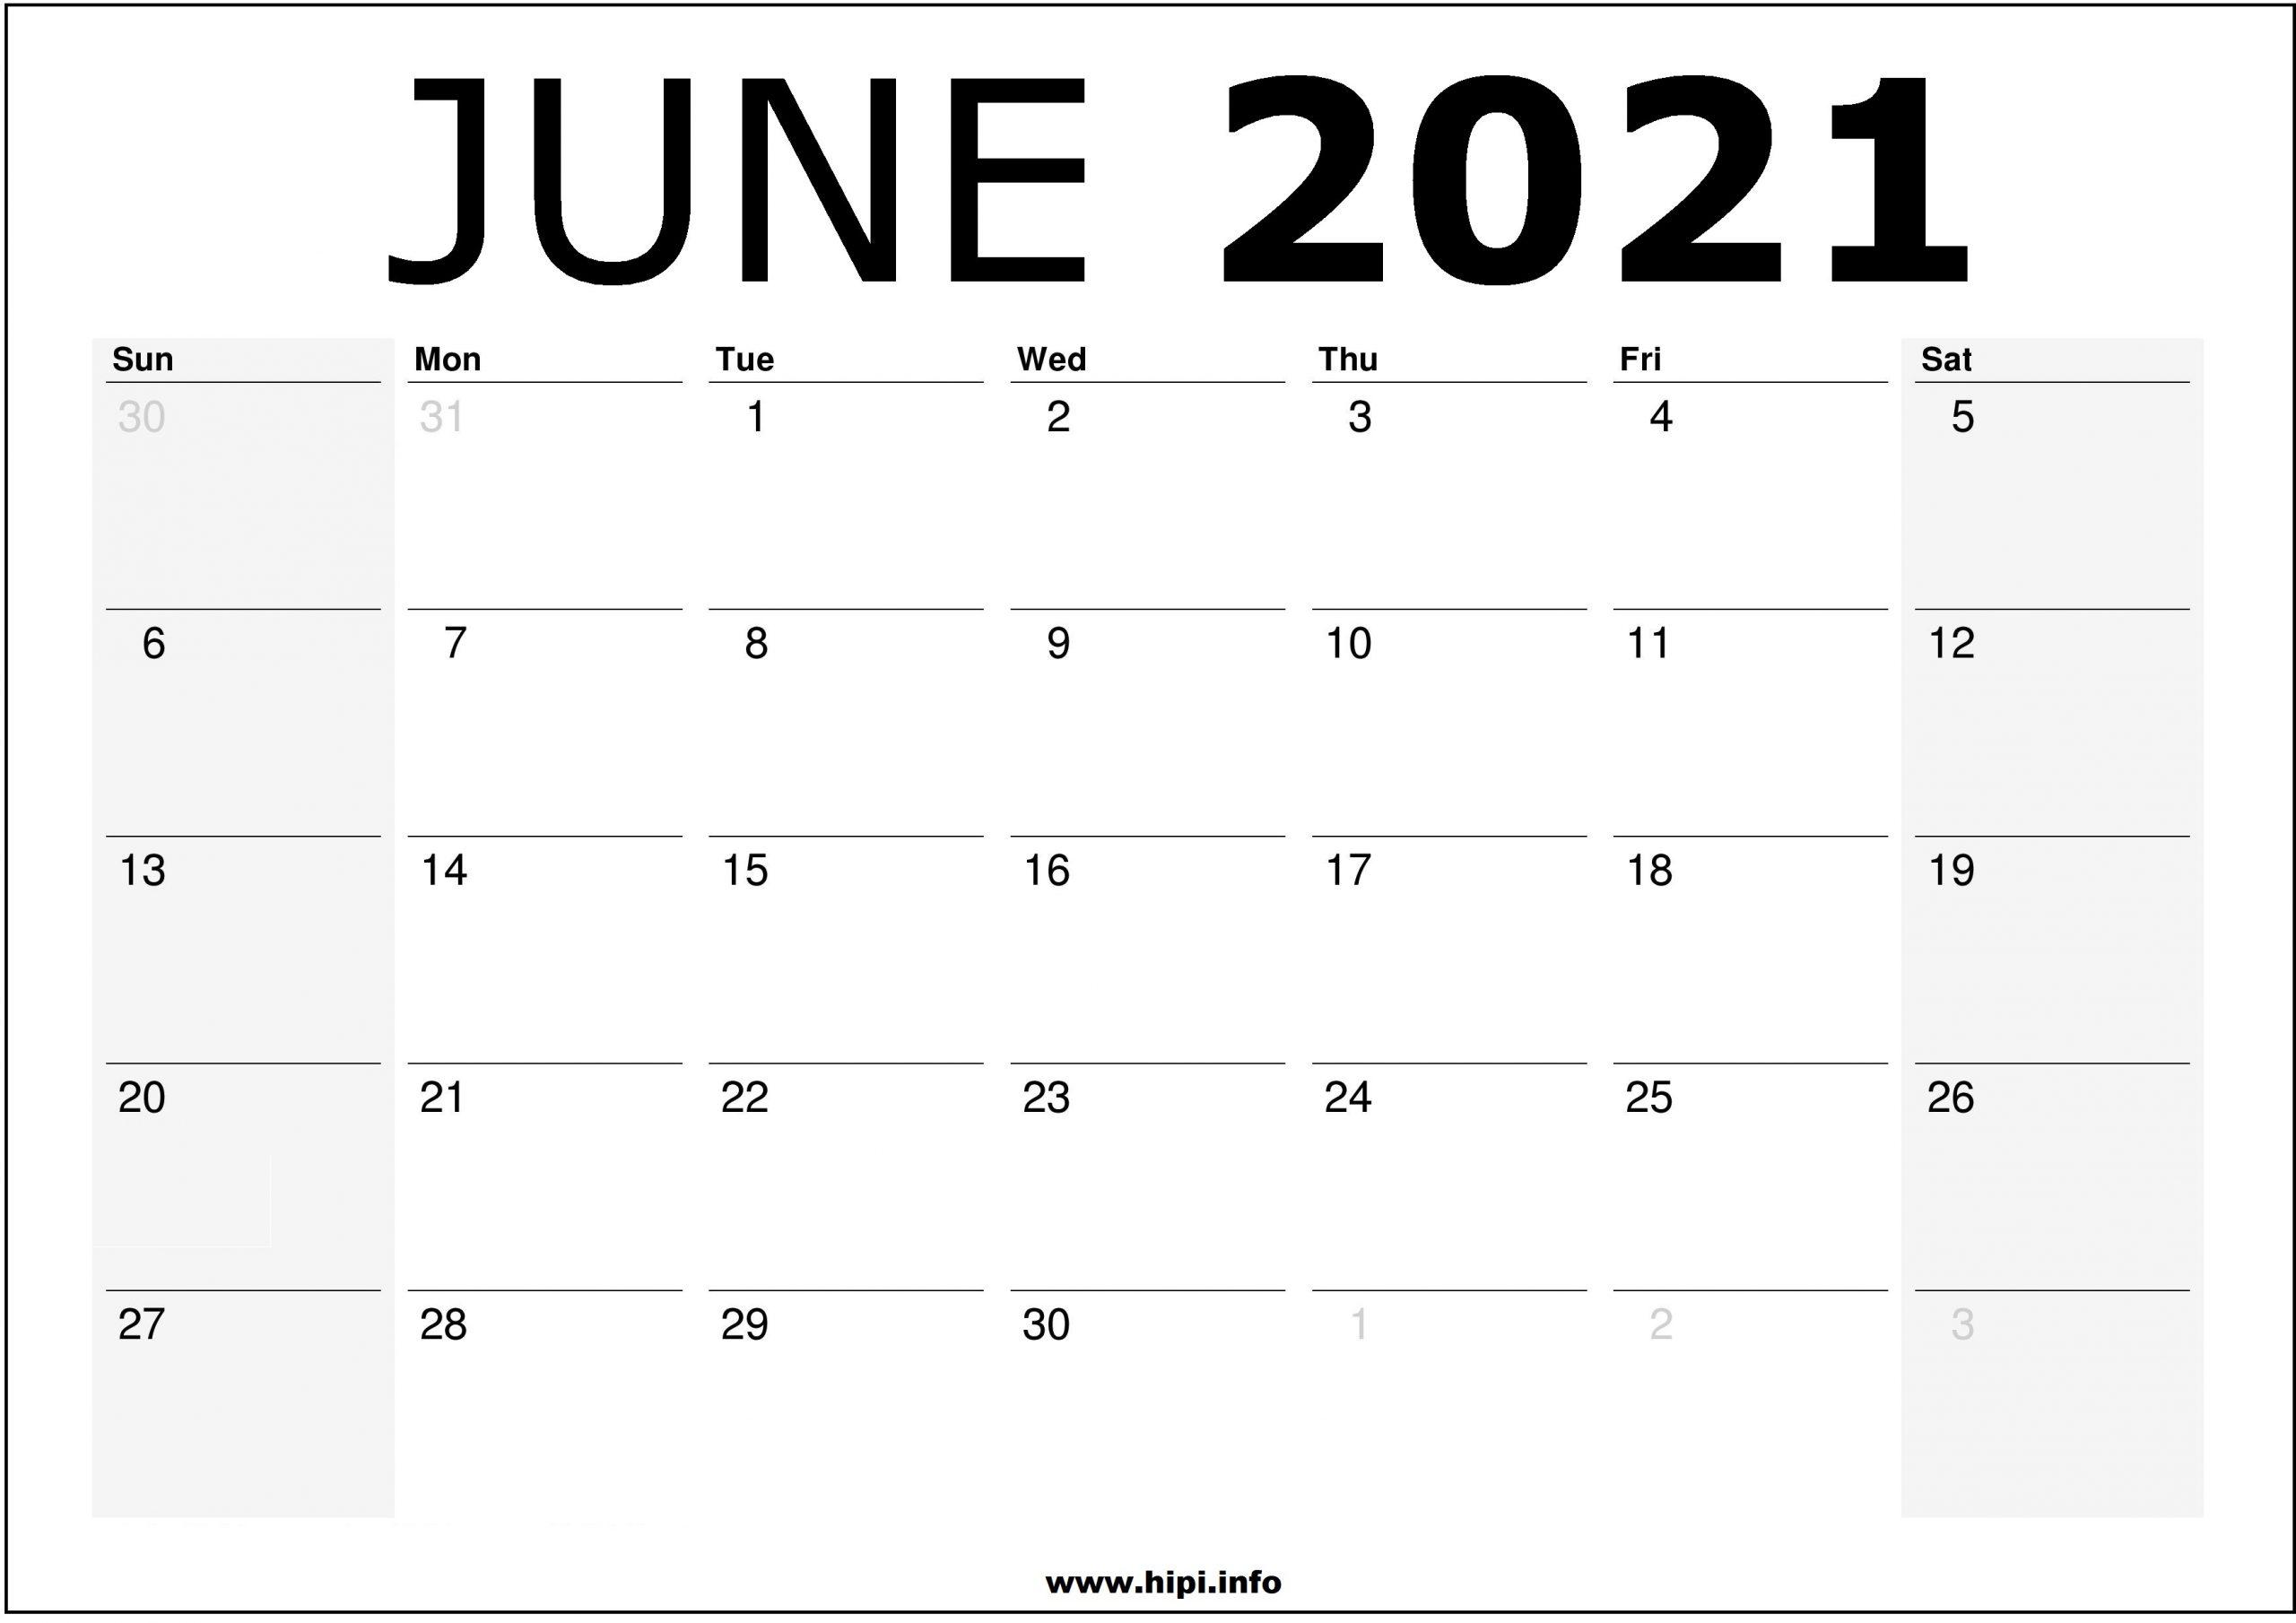 Printable Sunrise Sunset Calendar 2021   Printable With Regard To Printable Sunrise/Sunset Tables For 2021